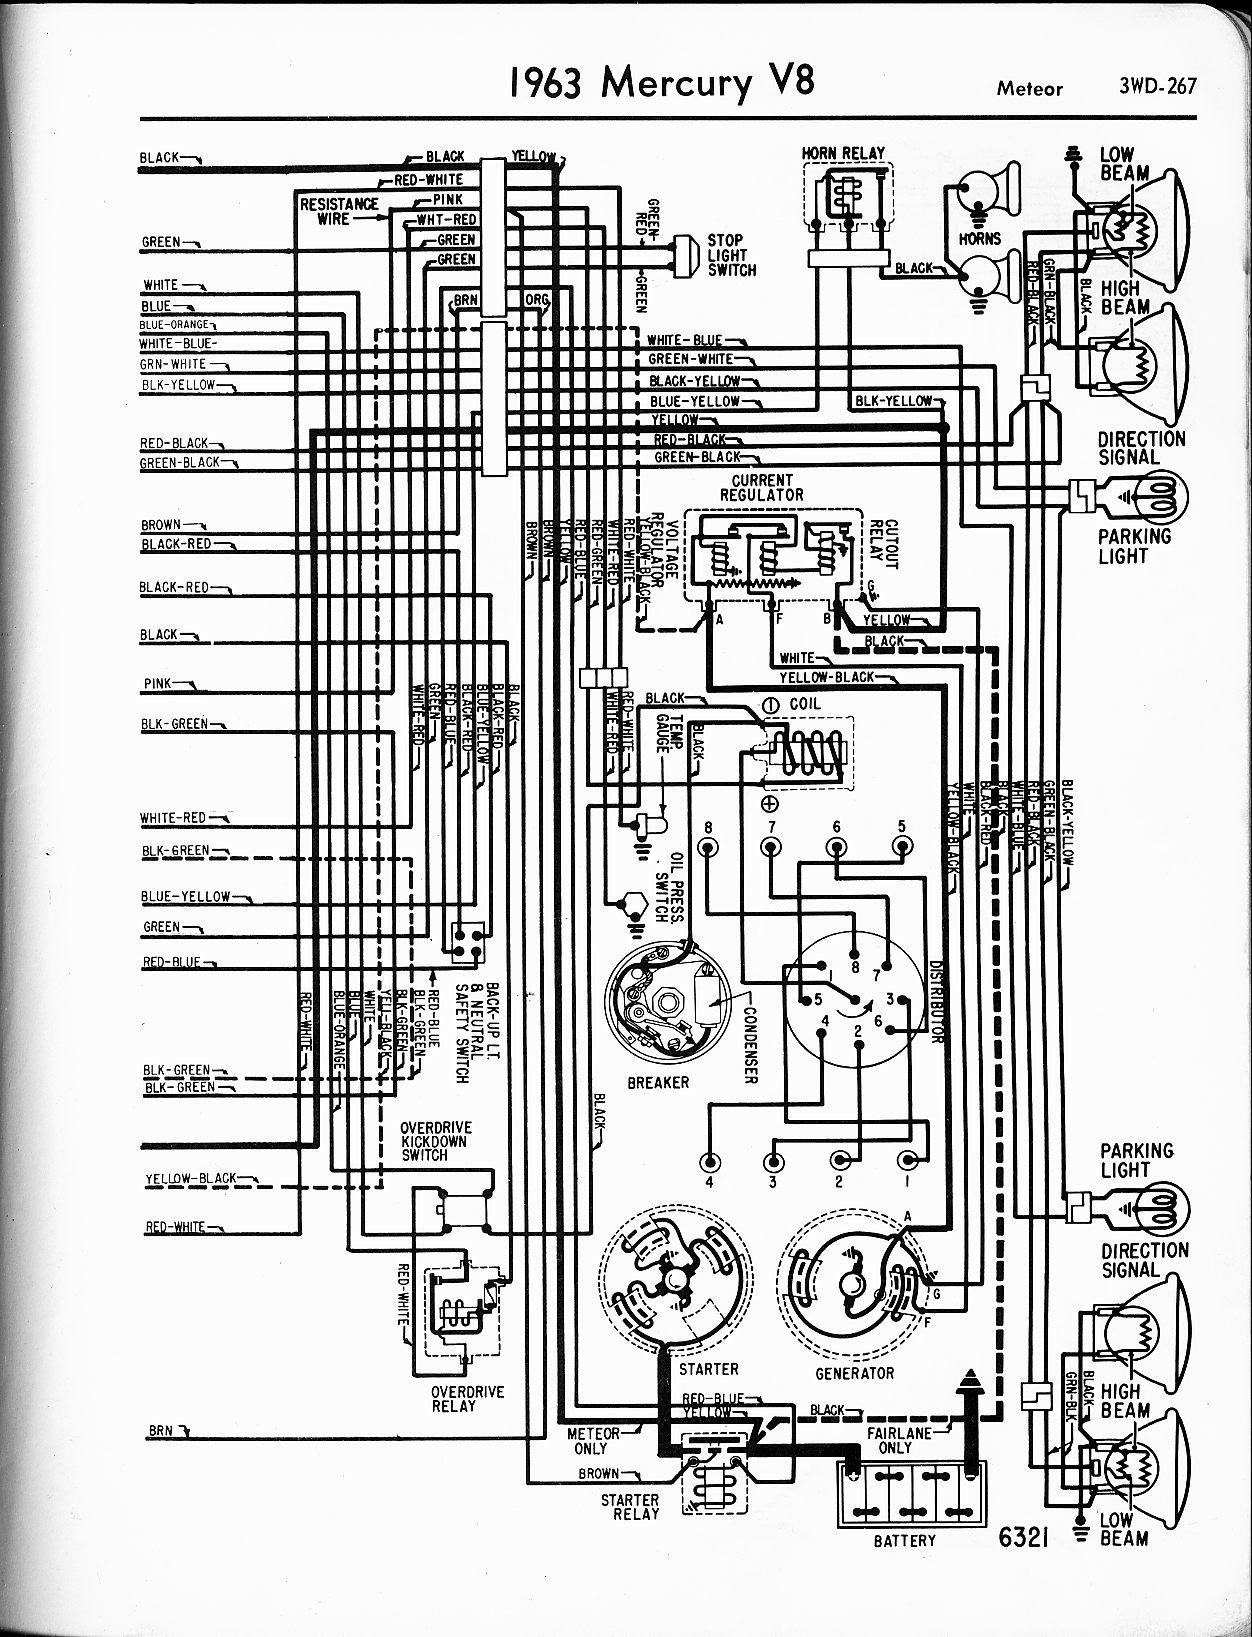 55 Chevy Turn Signal Wiring Diagram - Wiring Diagram